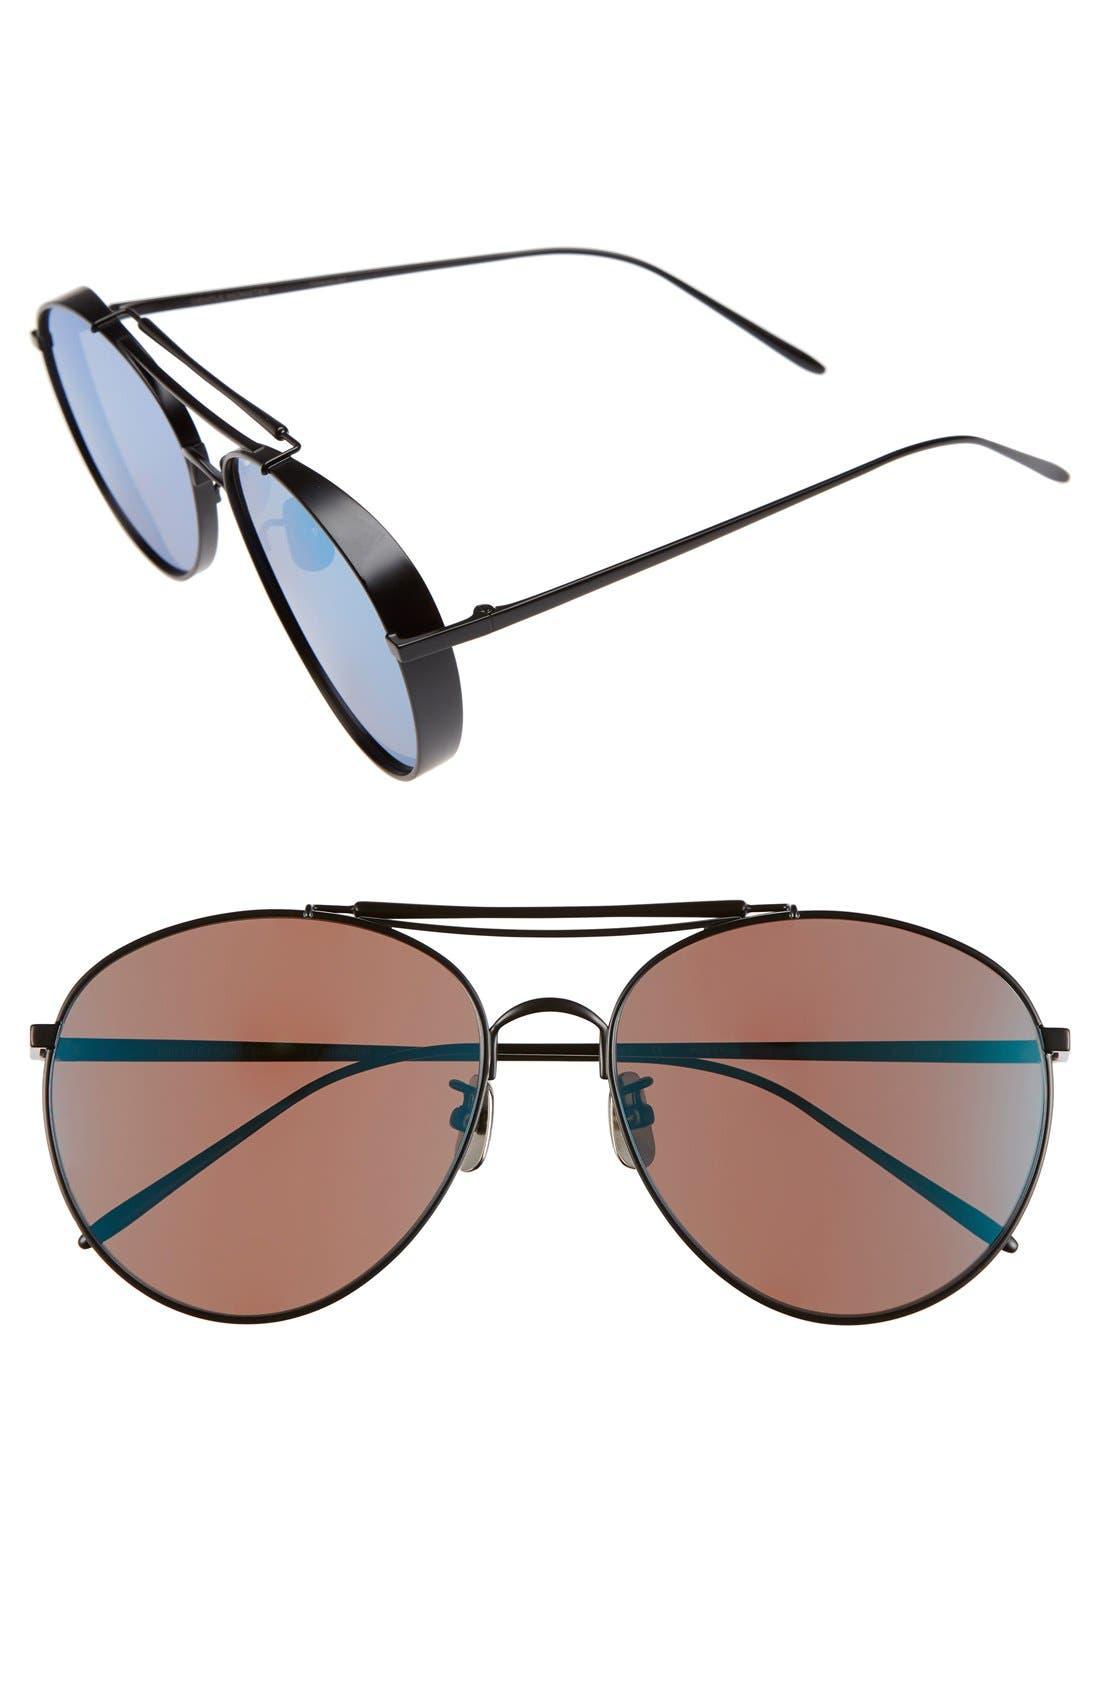 60mm Aviator Sunglasses,                         Main,                         color, Matte Black/ Blue Mirror